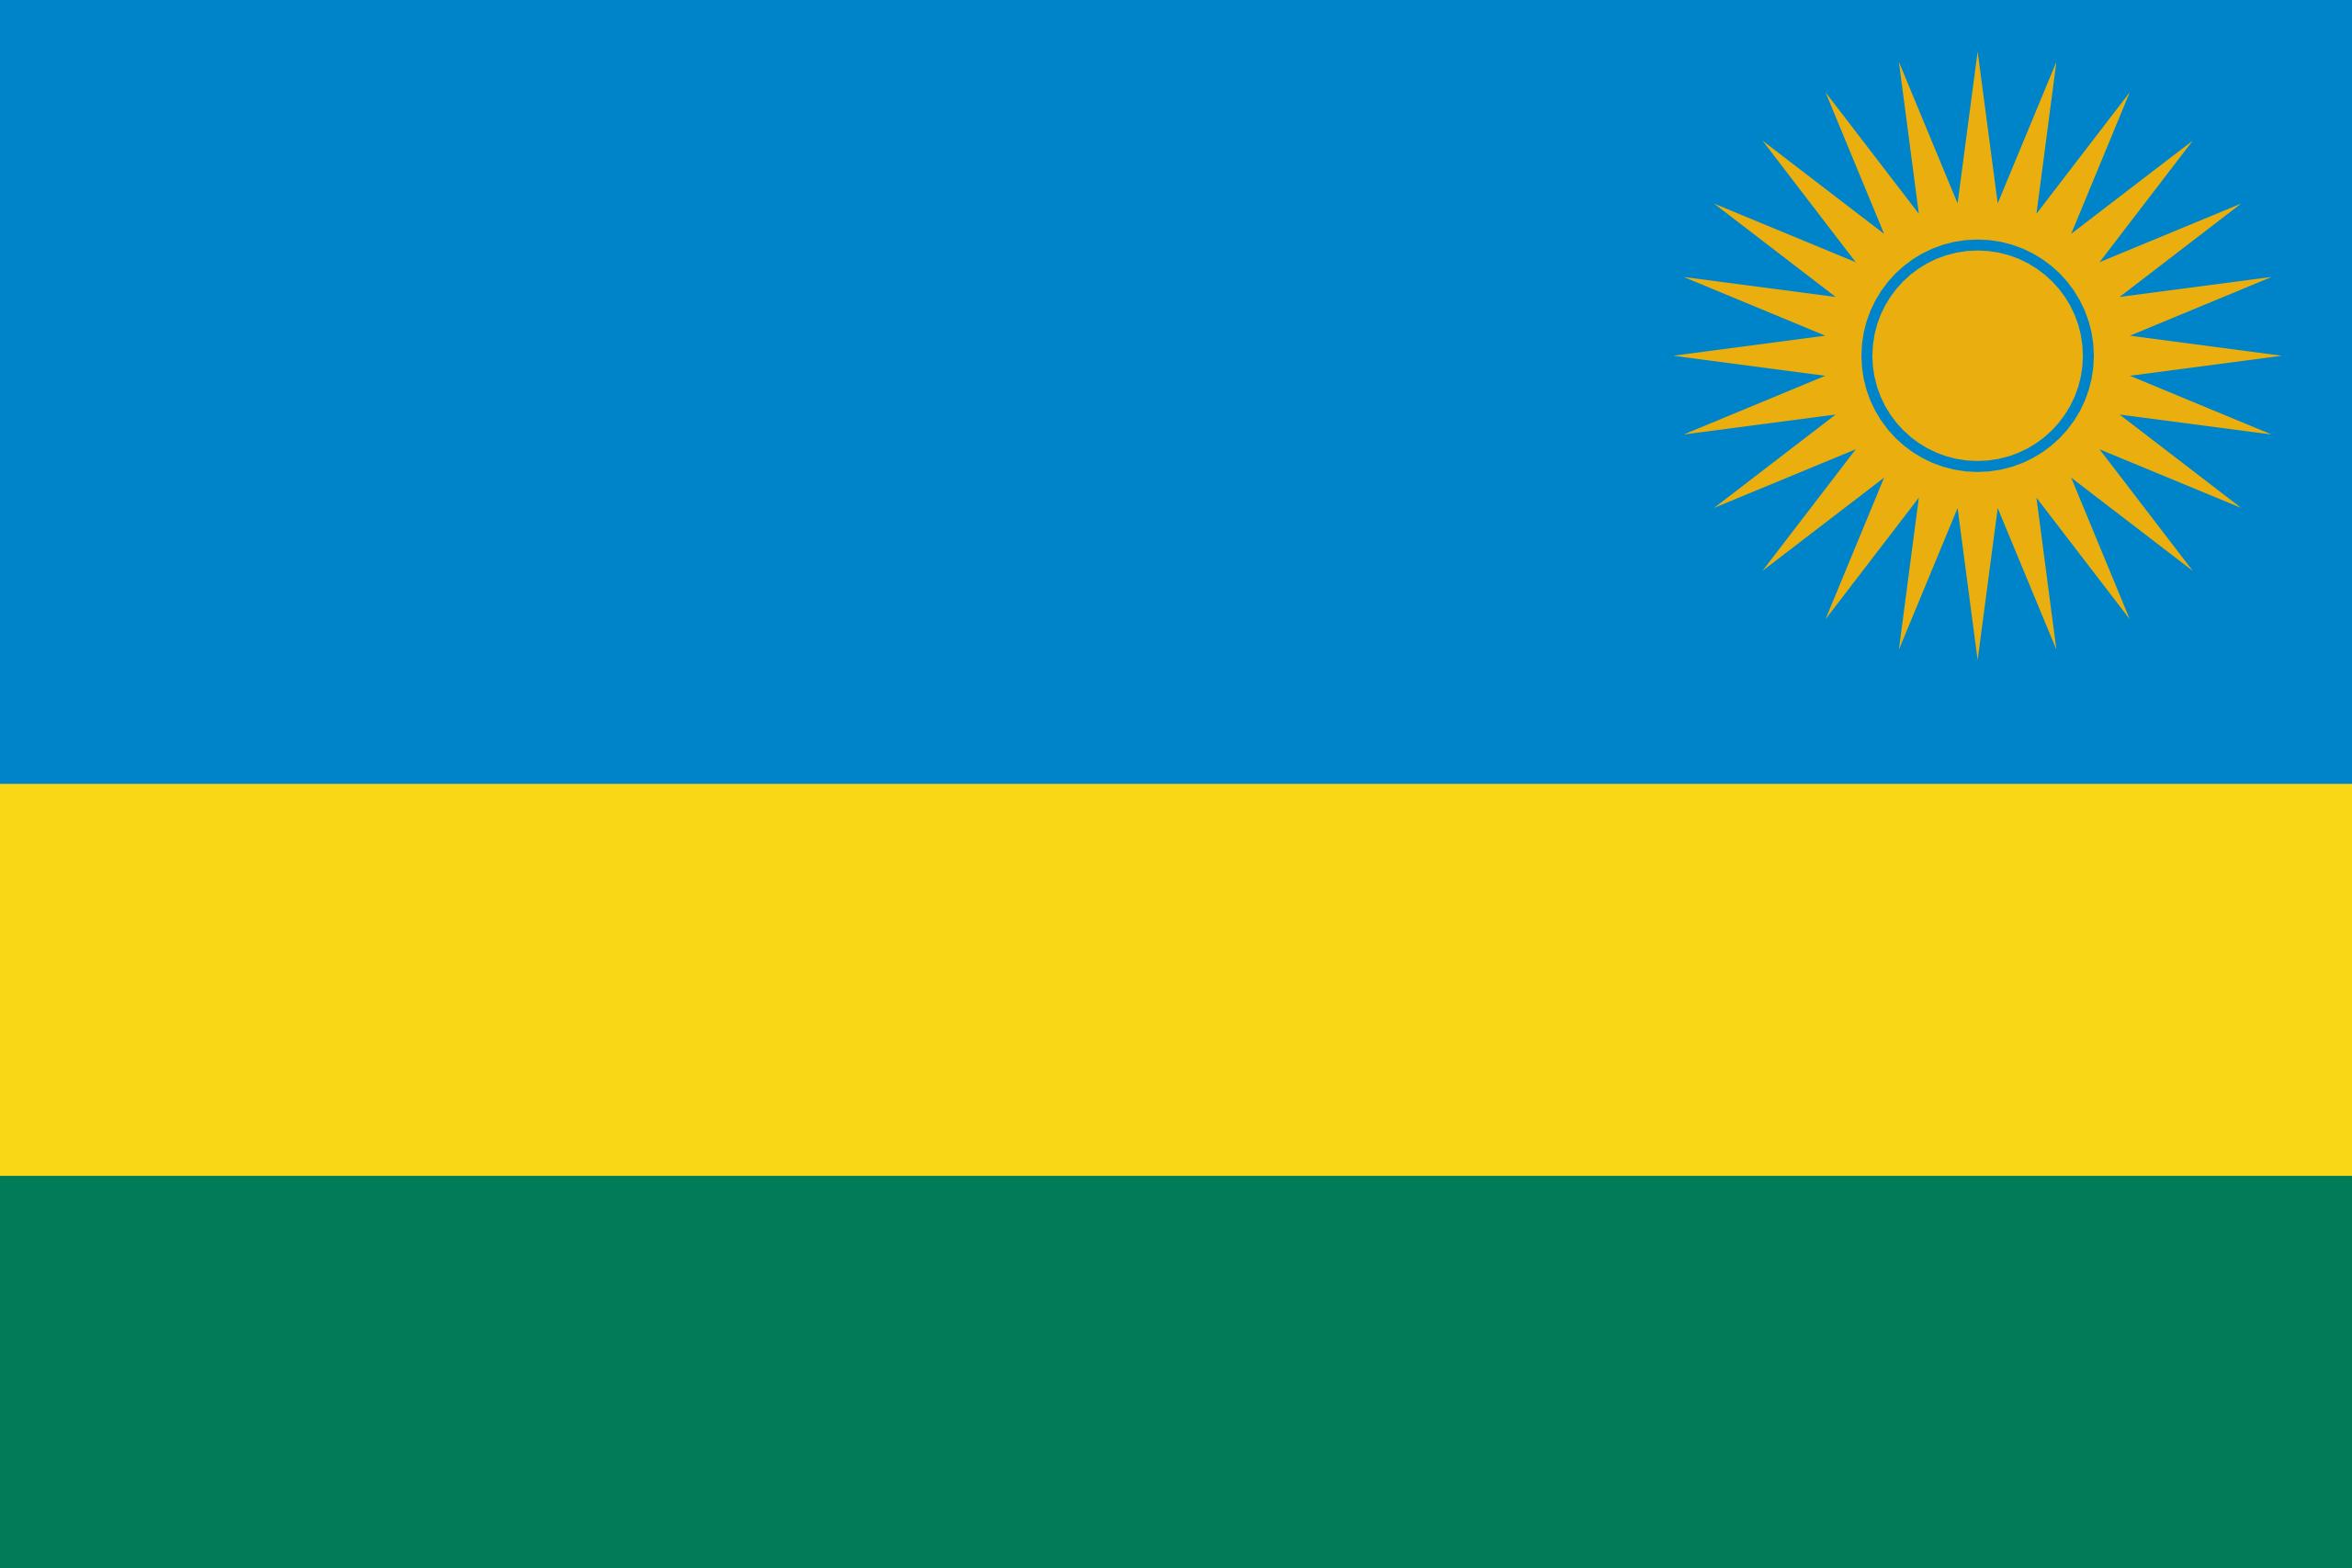 Drapeau du rwanda, café verte, café noir, café moulu